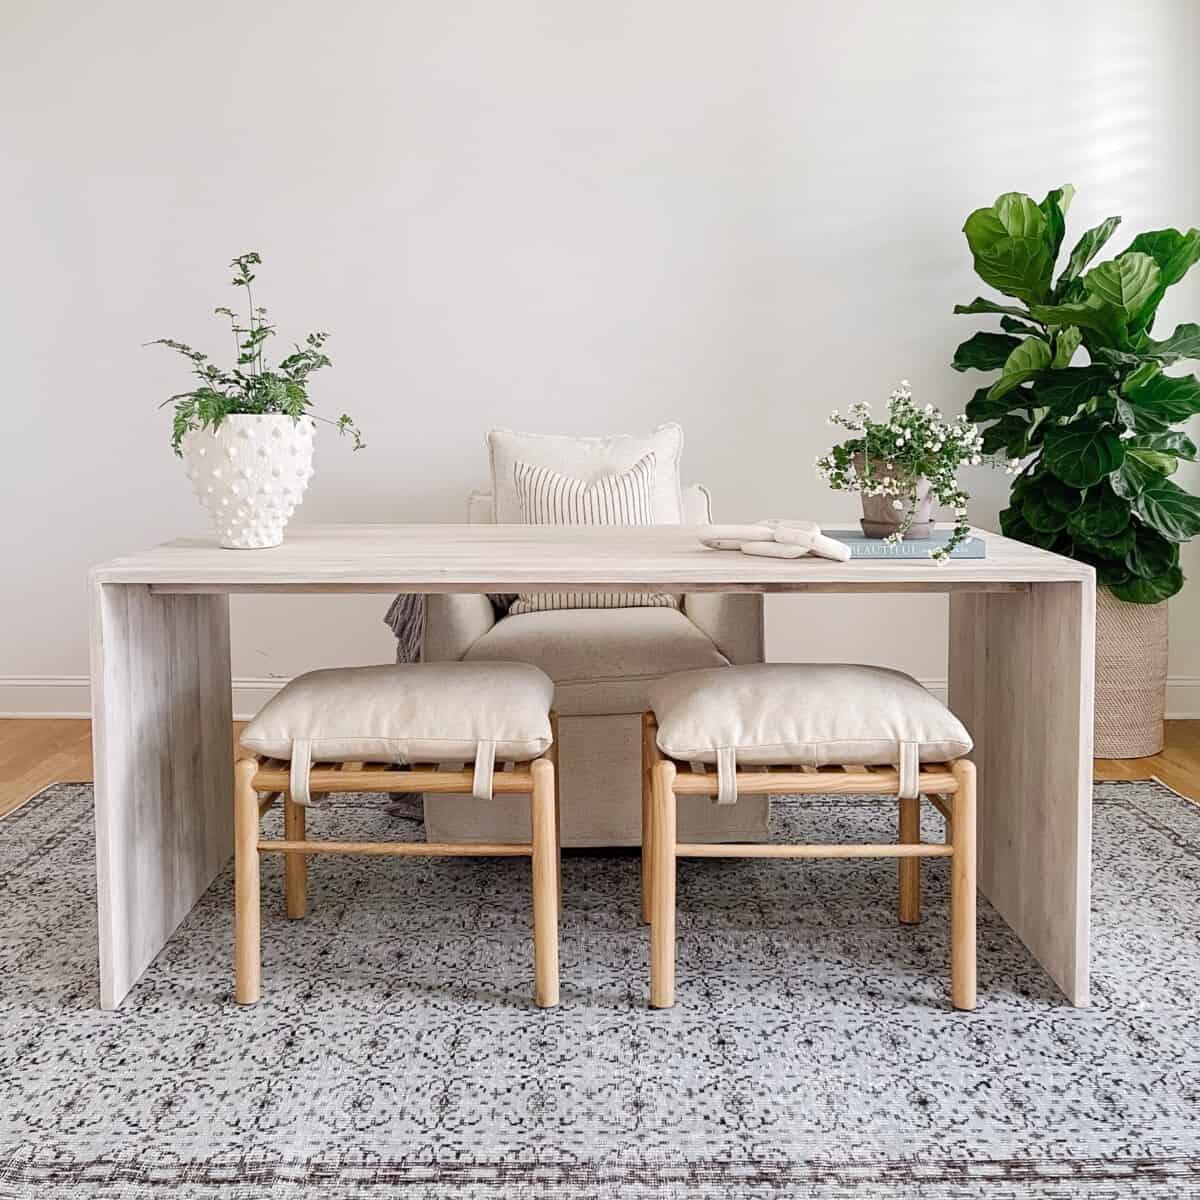 Our home office with a refinished u shaped oak desk and blue vintage rug from Revival Rugs. #blue #bluerug #coastaloffice #homeoffice #refinisheddesk #officedesk #vintagerug #vintagerugs #handknottedrug #turkishrug #blueturkishrug